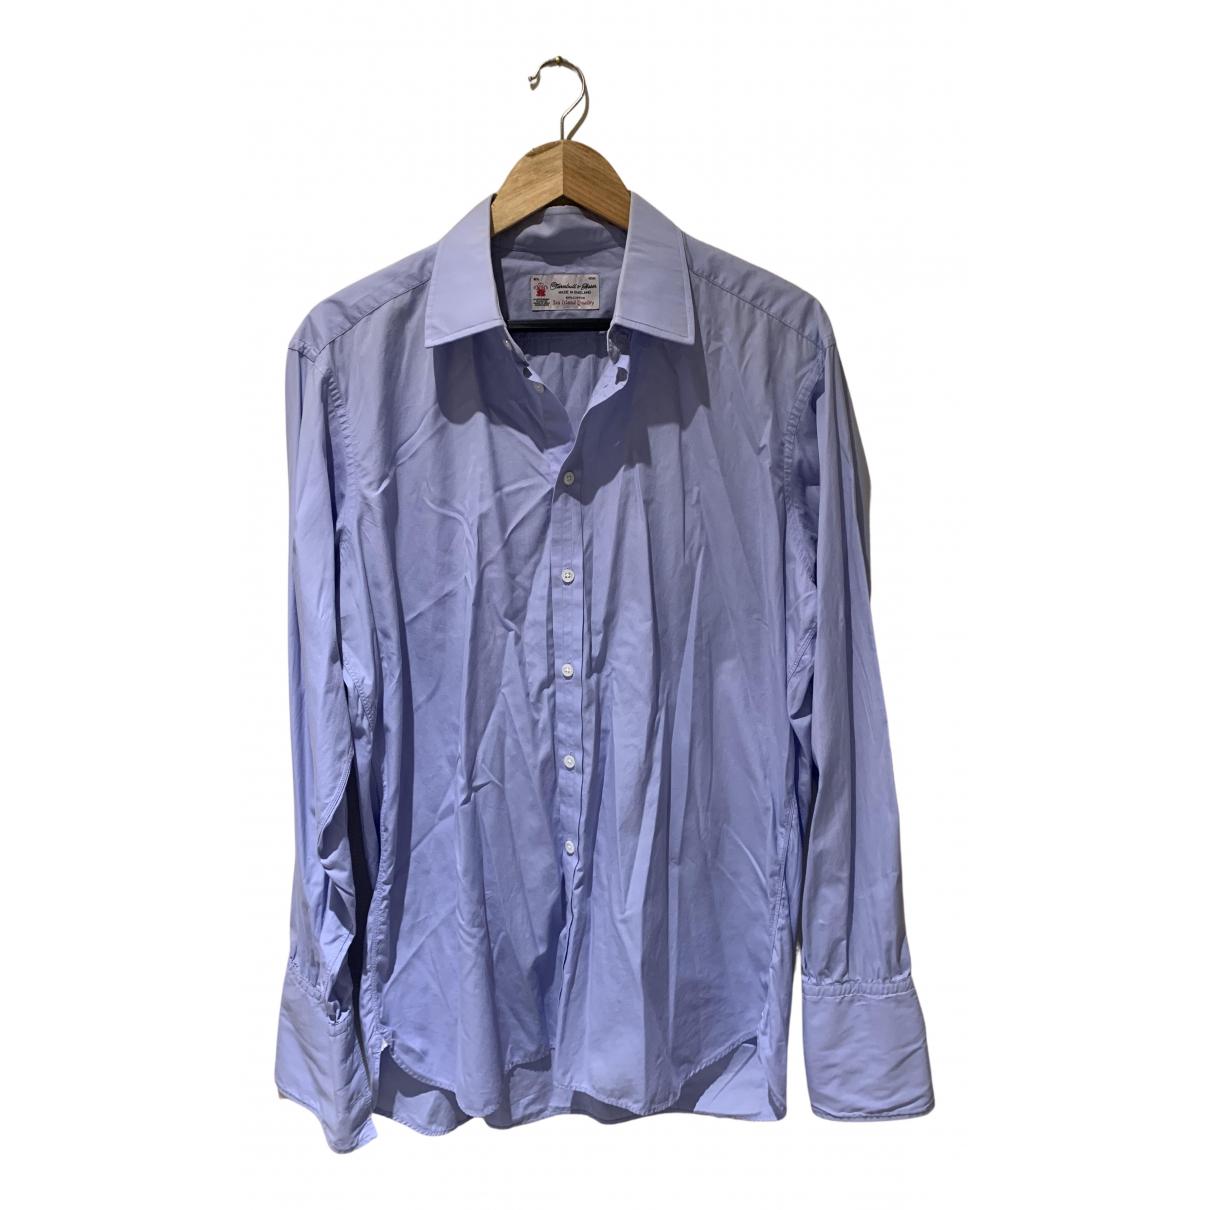 Turnbull & Asser N Blue Cotton Shirts for Men 16.5 UK - US (tour de cou / collar)